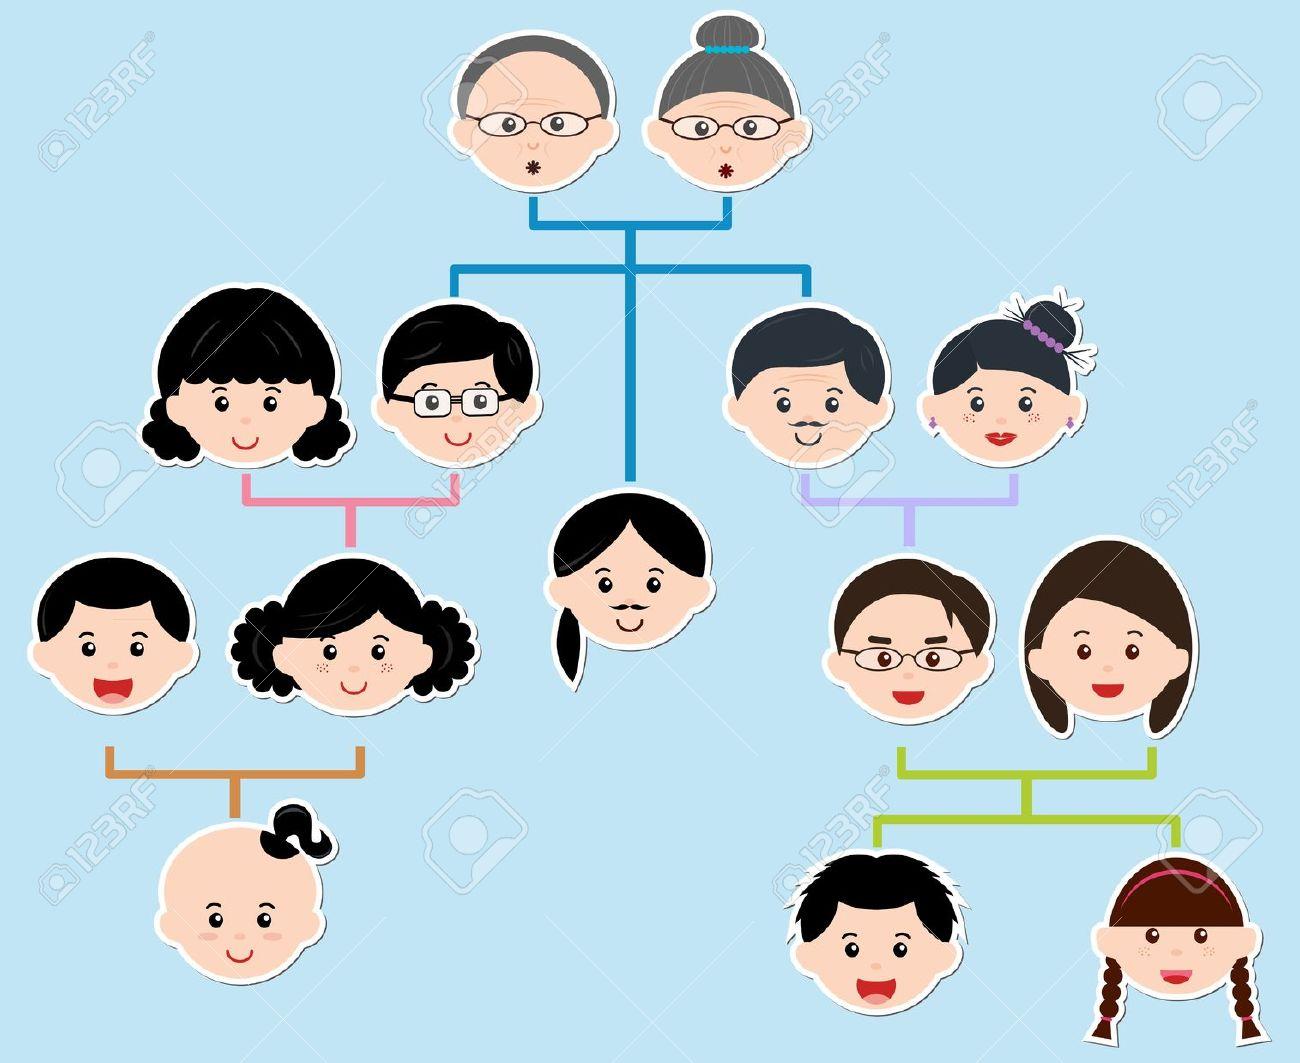 9 clipart family tree maker public domain vectors.